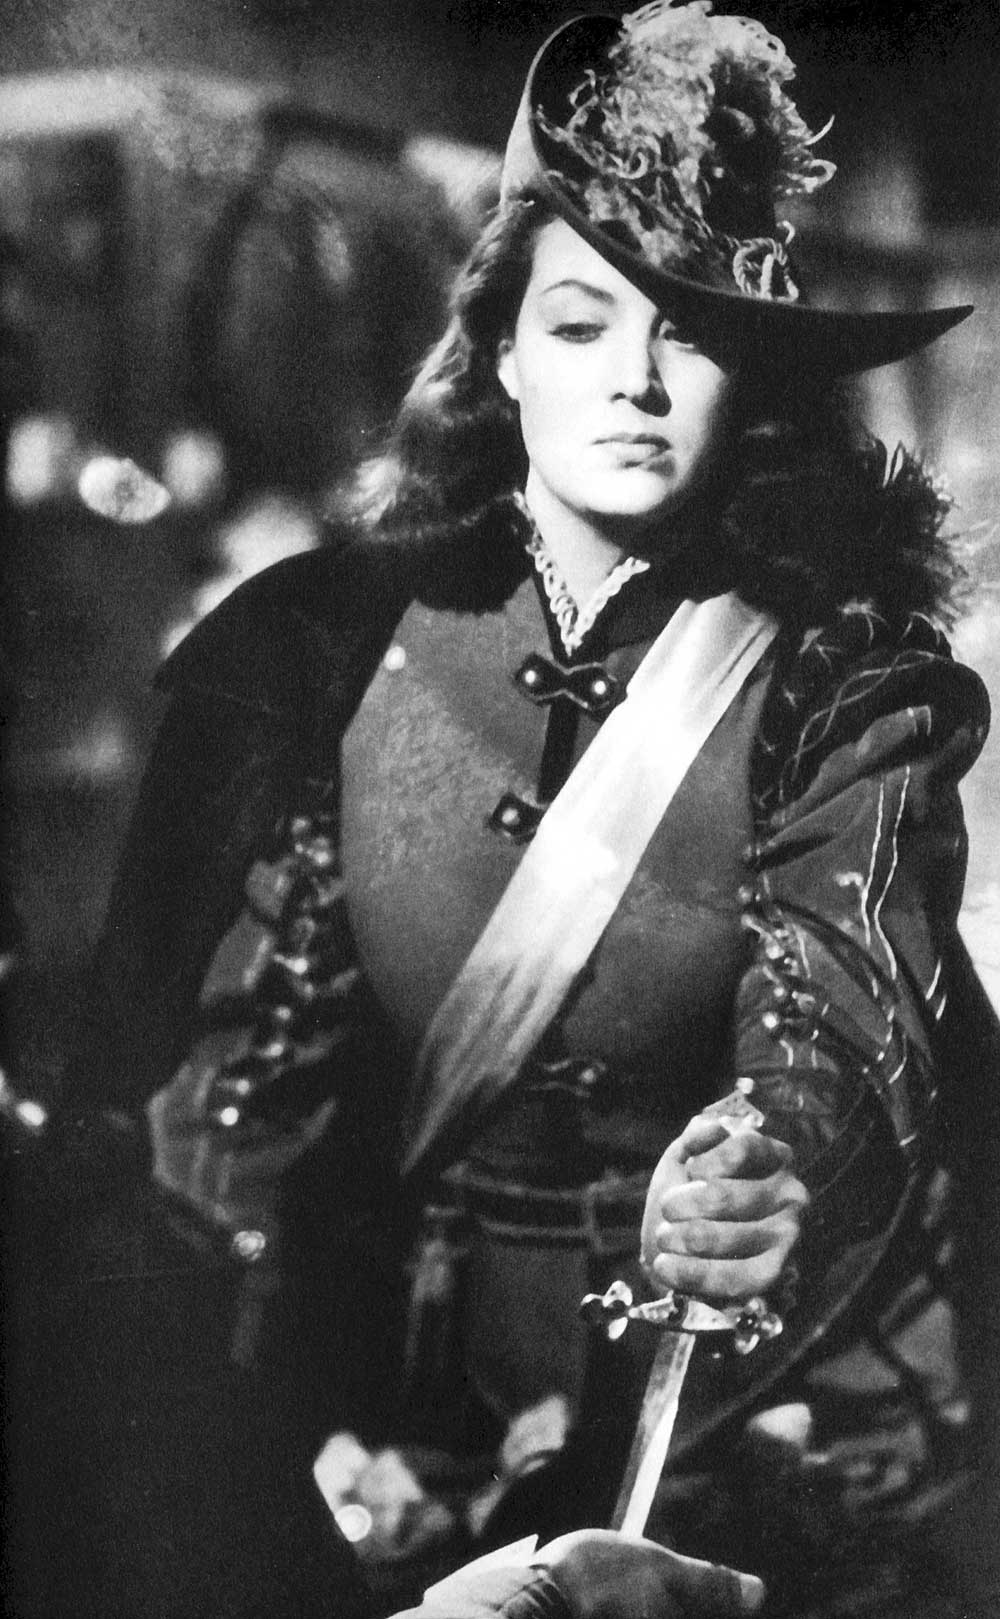 Maria Flix as Catalina de Erauso